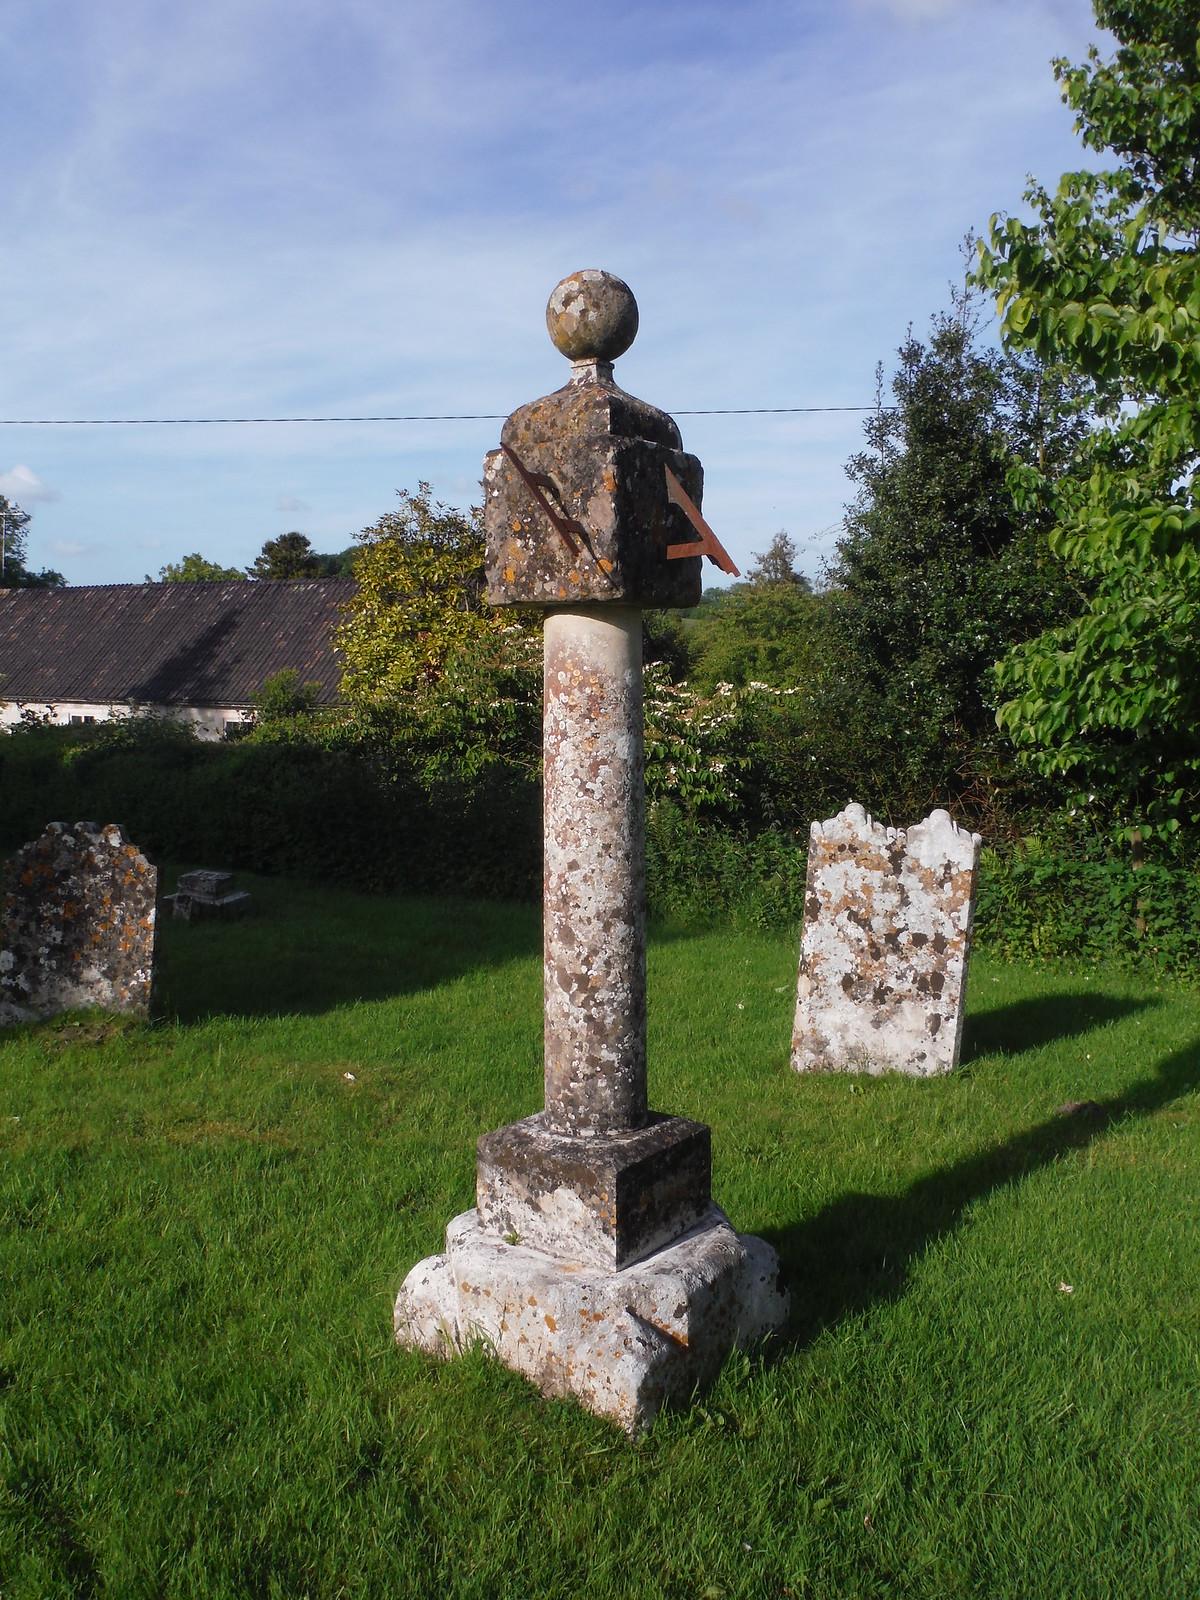 Grade II-listed Sundial at All Saints, Sutton Mandeville SWC Walk 249 Tisbury Circular via Dinton and Fovant